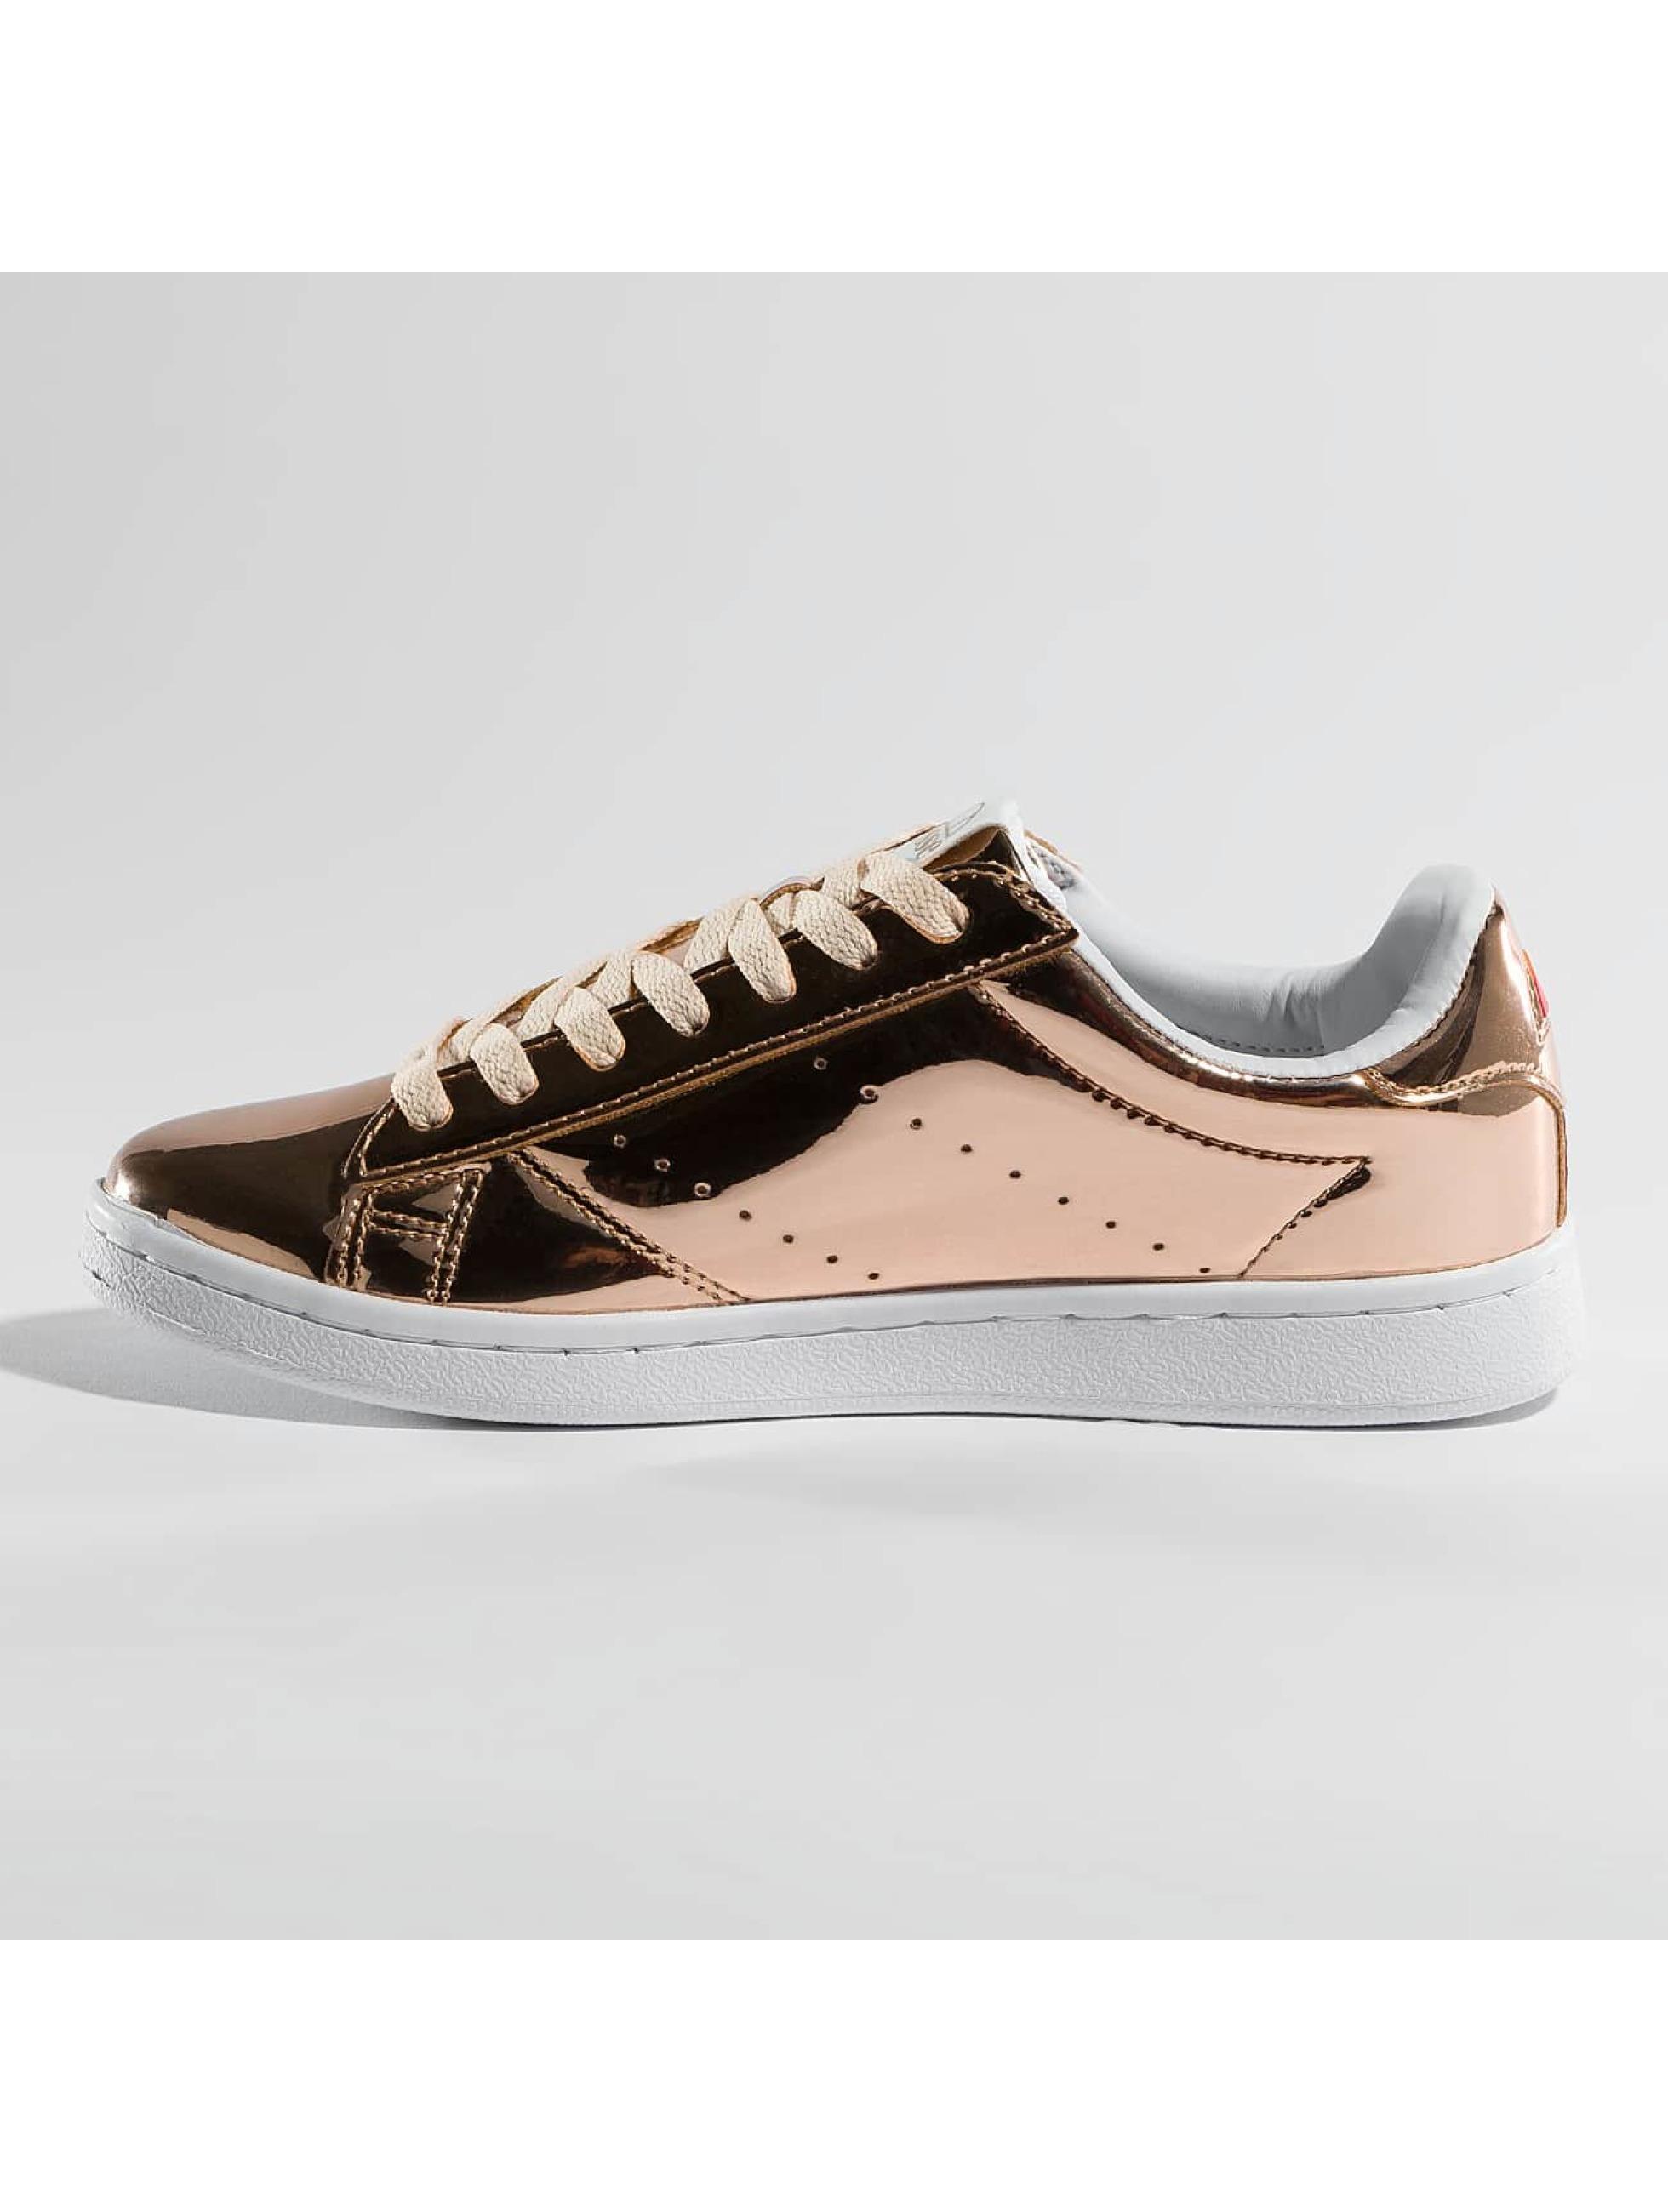 Ellesse Sneakers Heritage Anzia Metallic gold